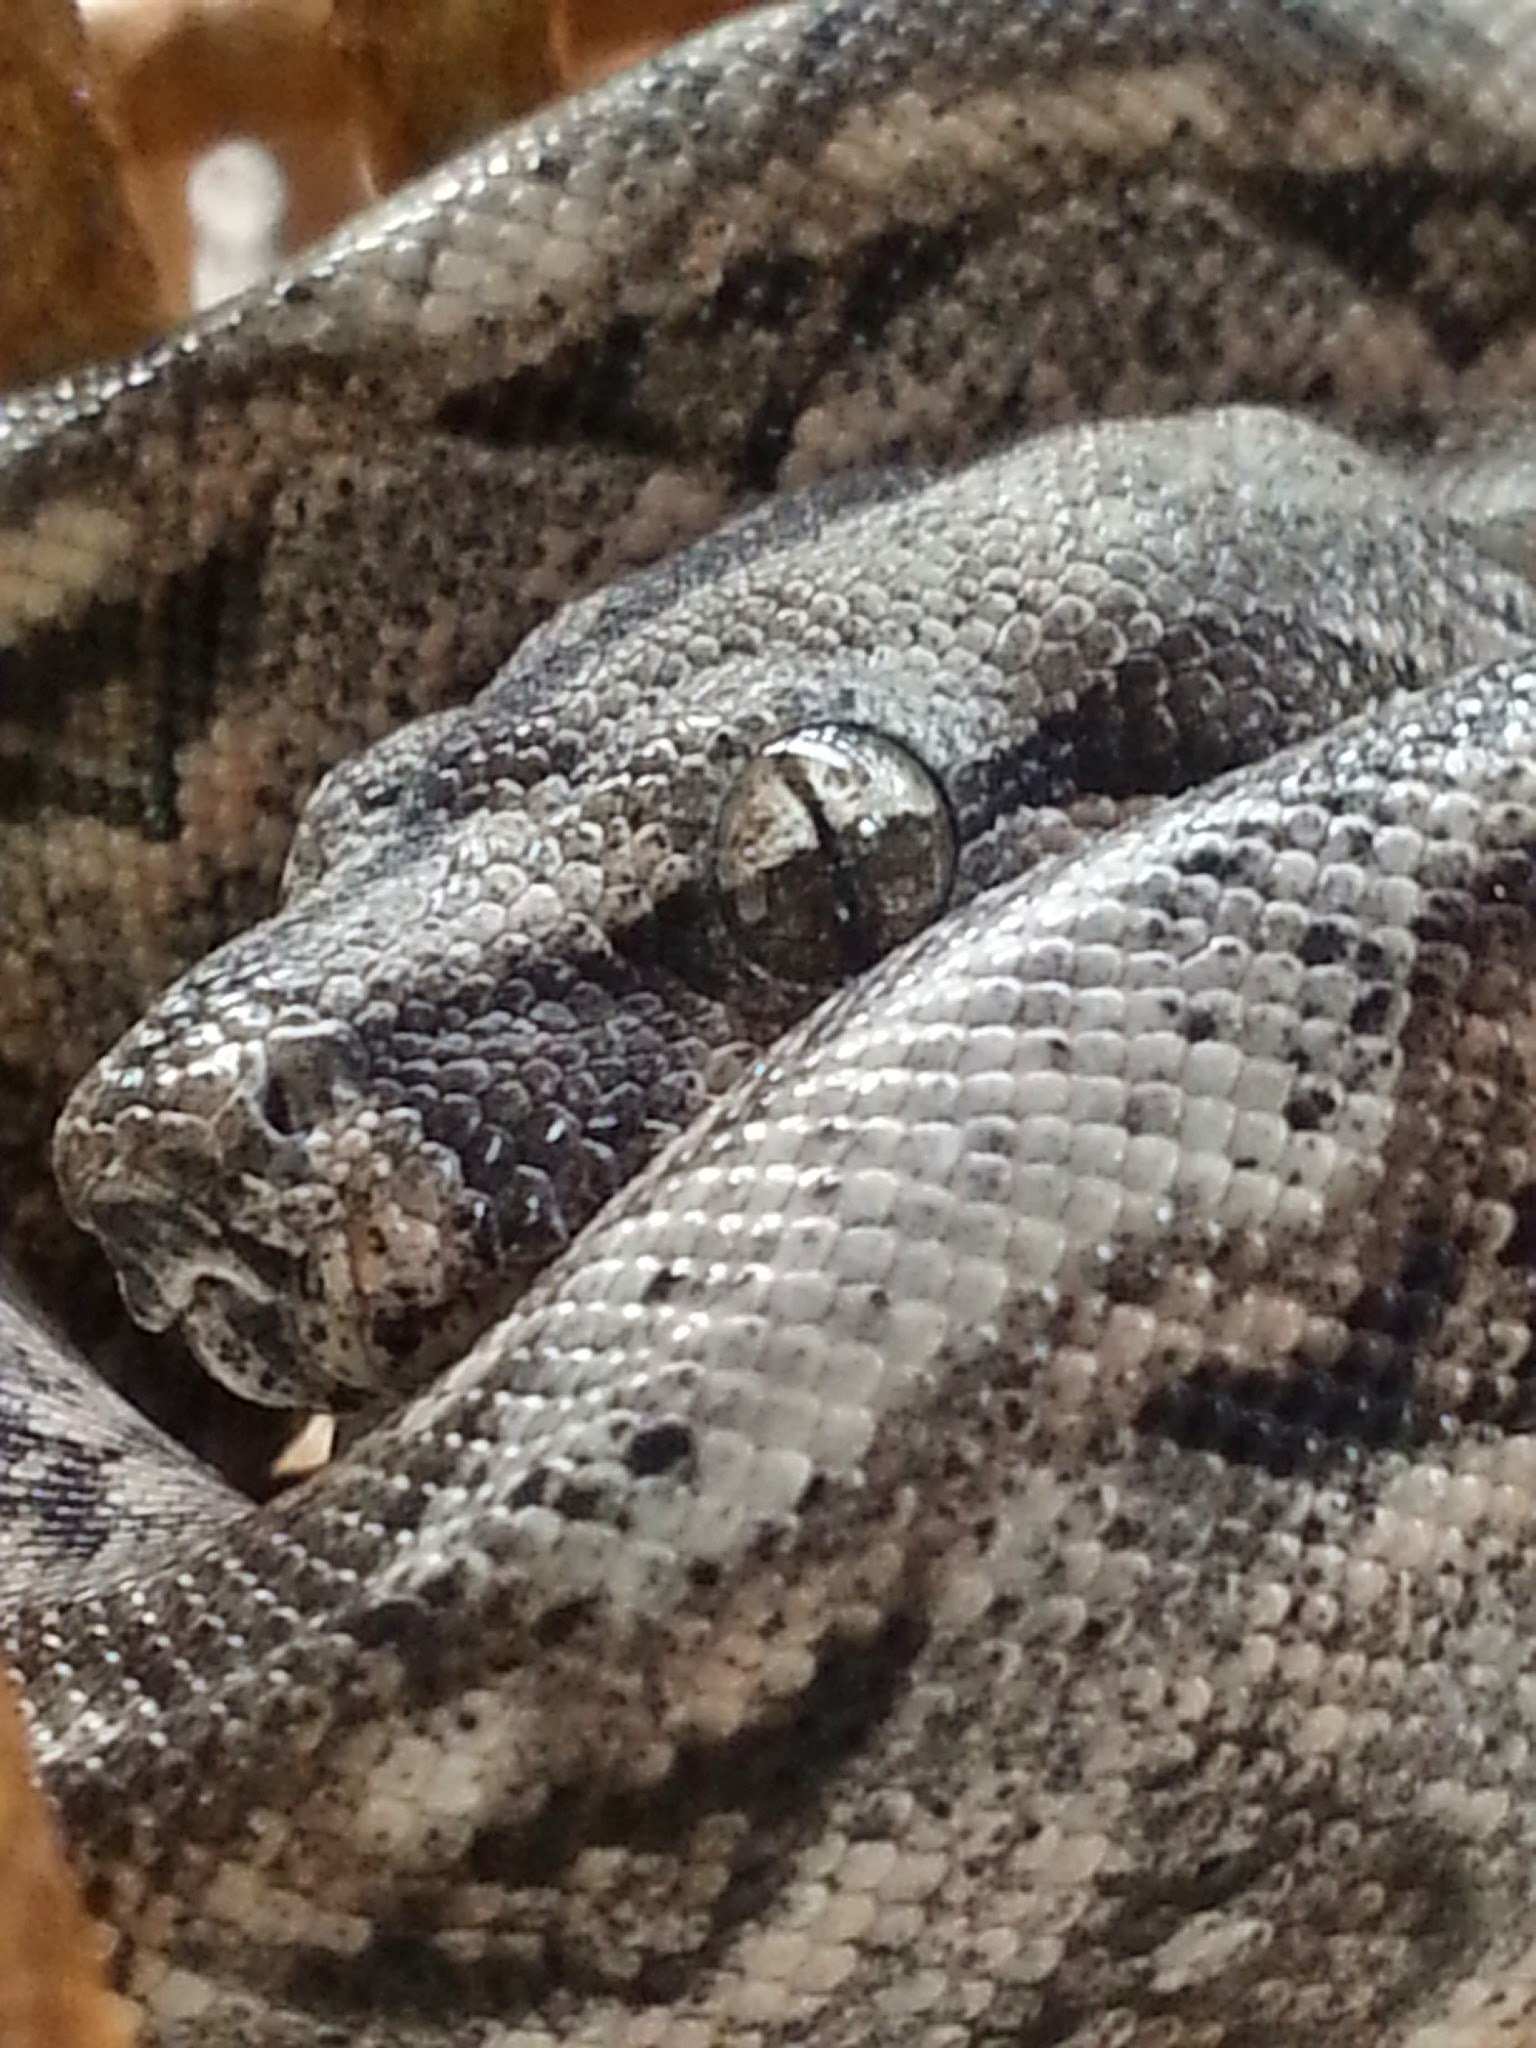 Image of Common boa constrictor